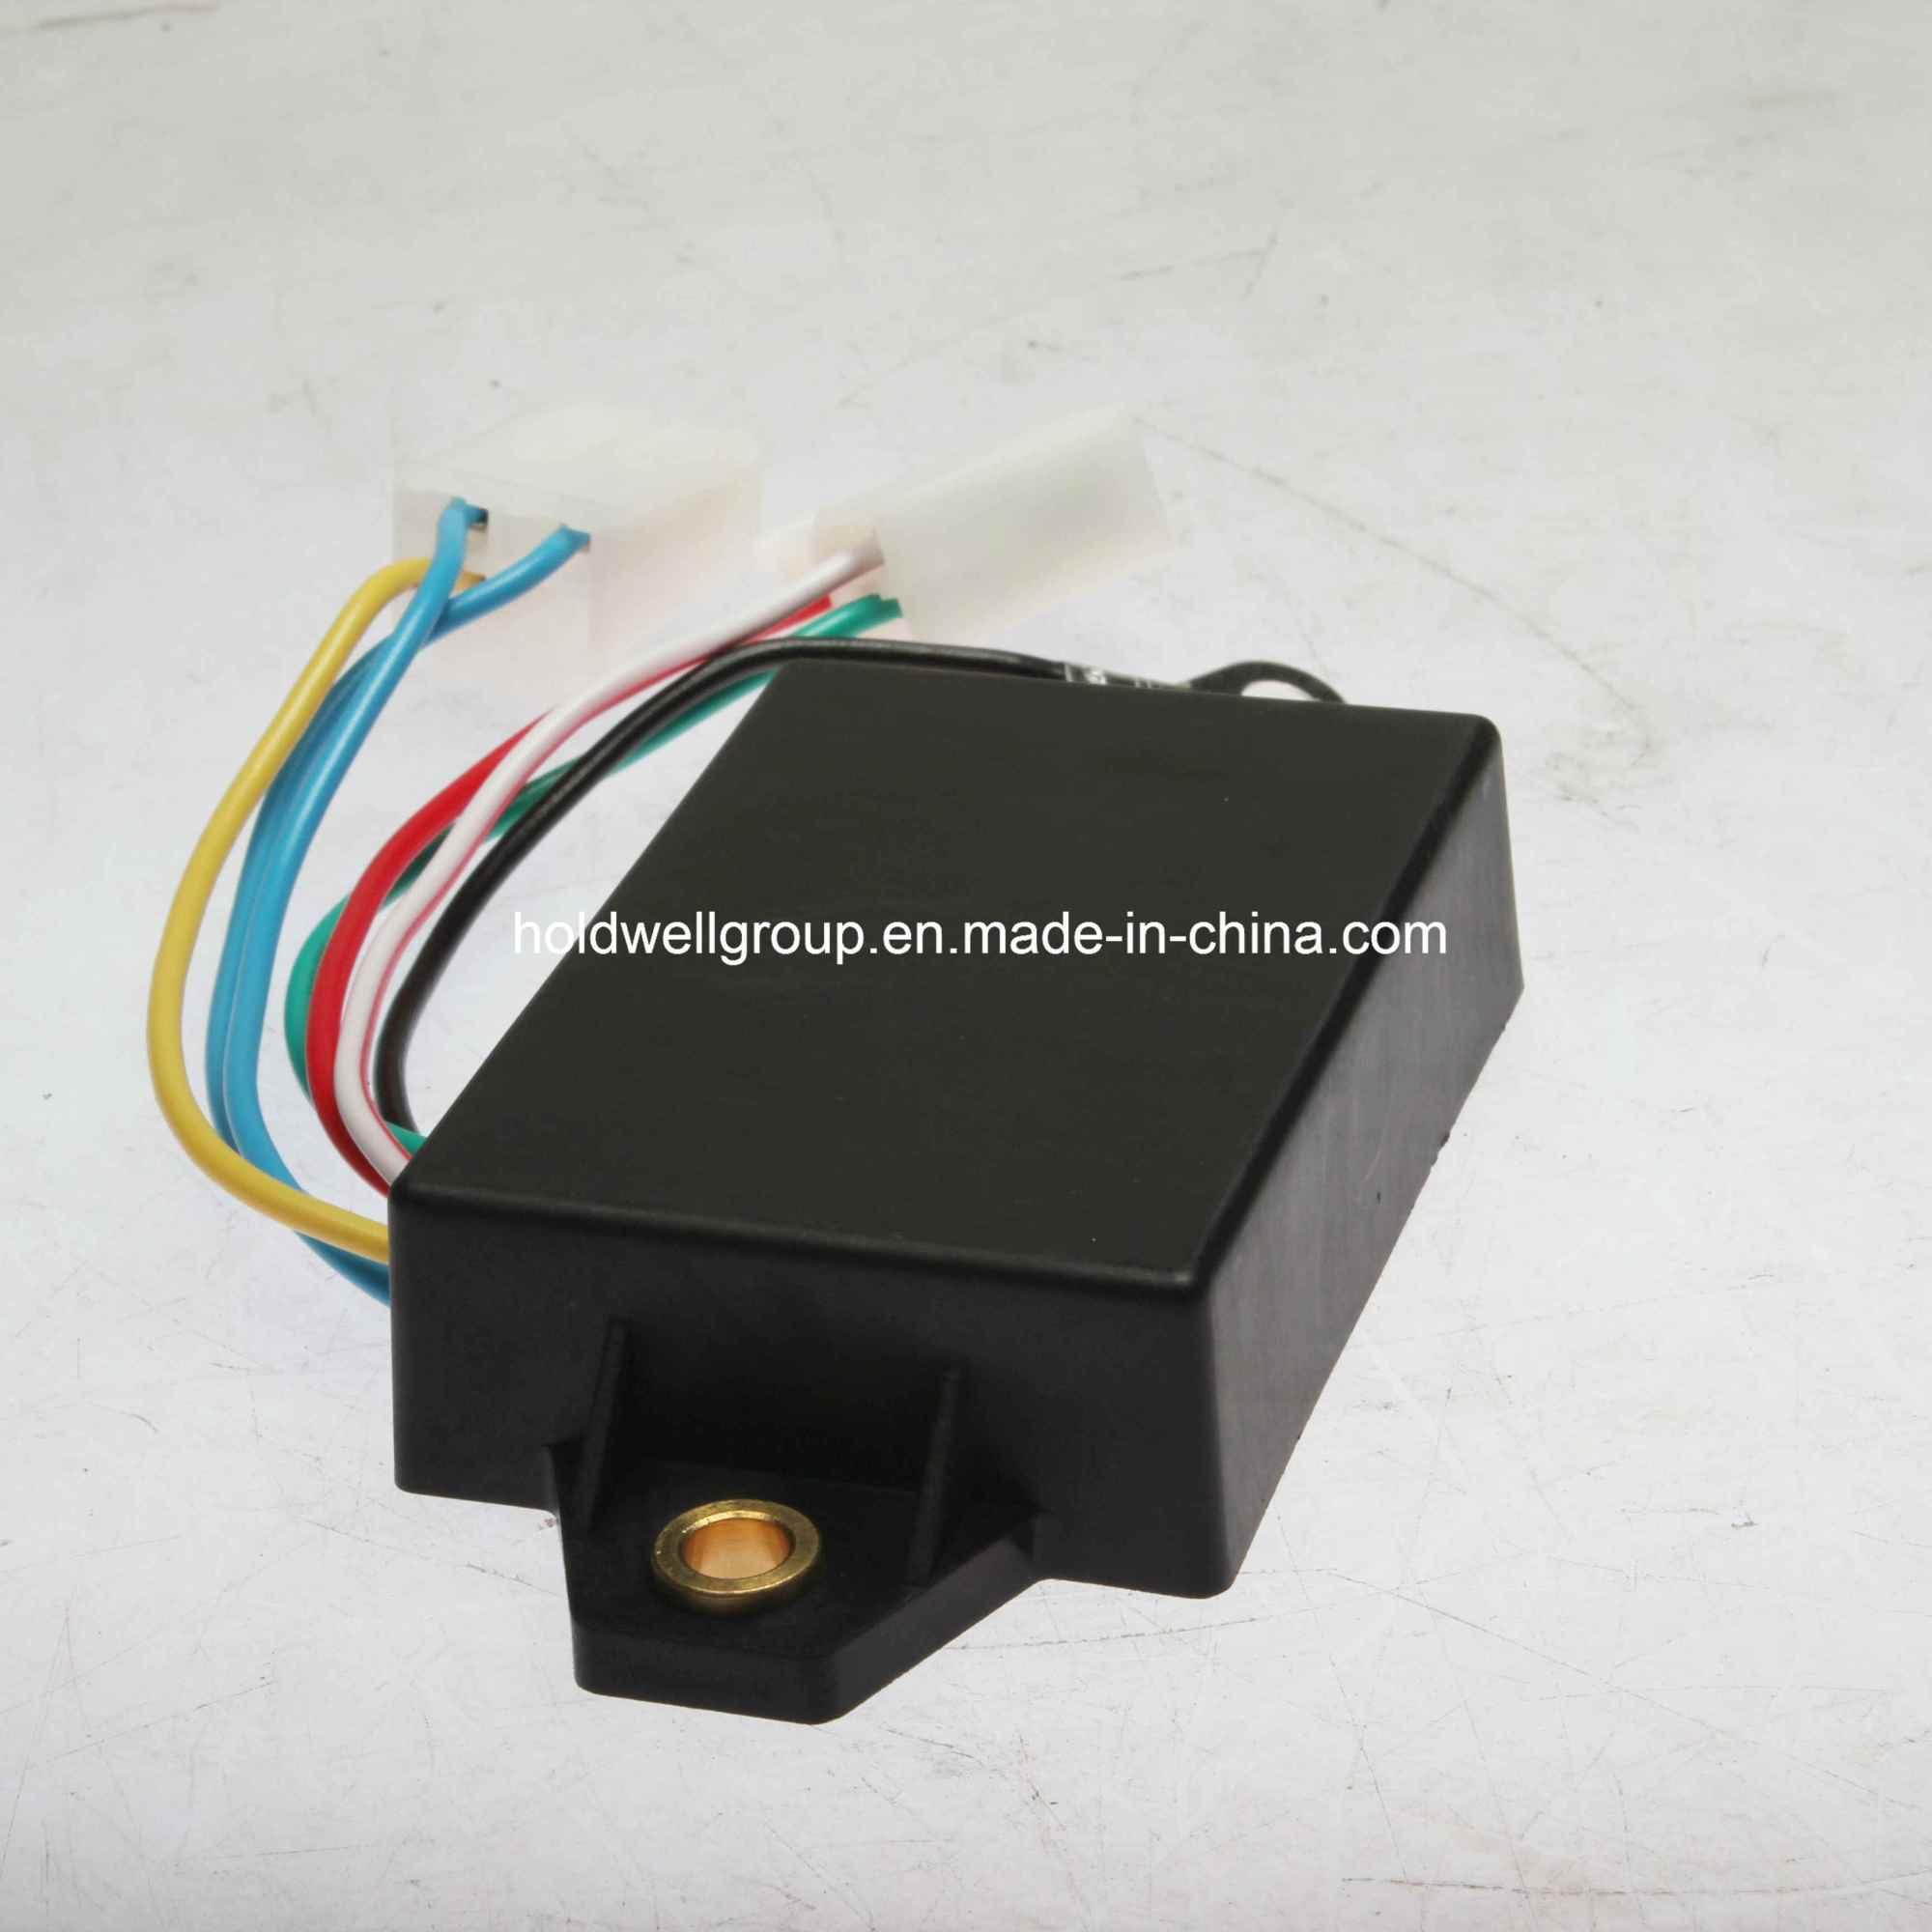 hight resolution of china mitsubishi iseki tractor diesel engine glowplug timer unit voltage regulator mm409675 mm435745 mm434825 16a1114001 for mt14 mt160 mt2001d mtx225